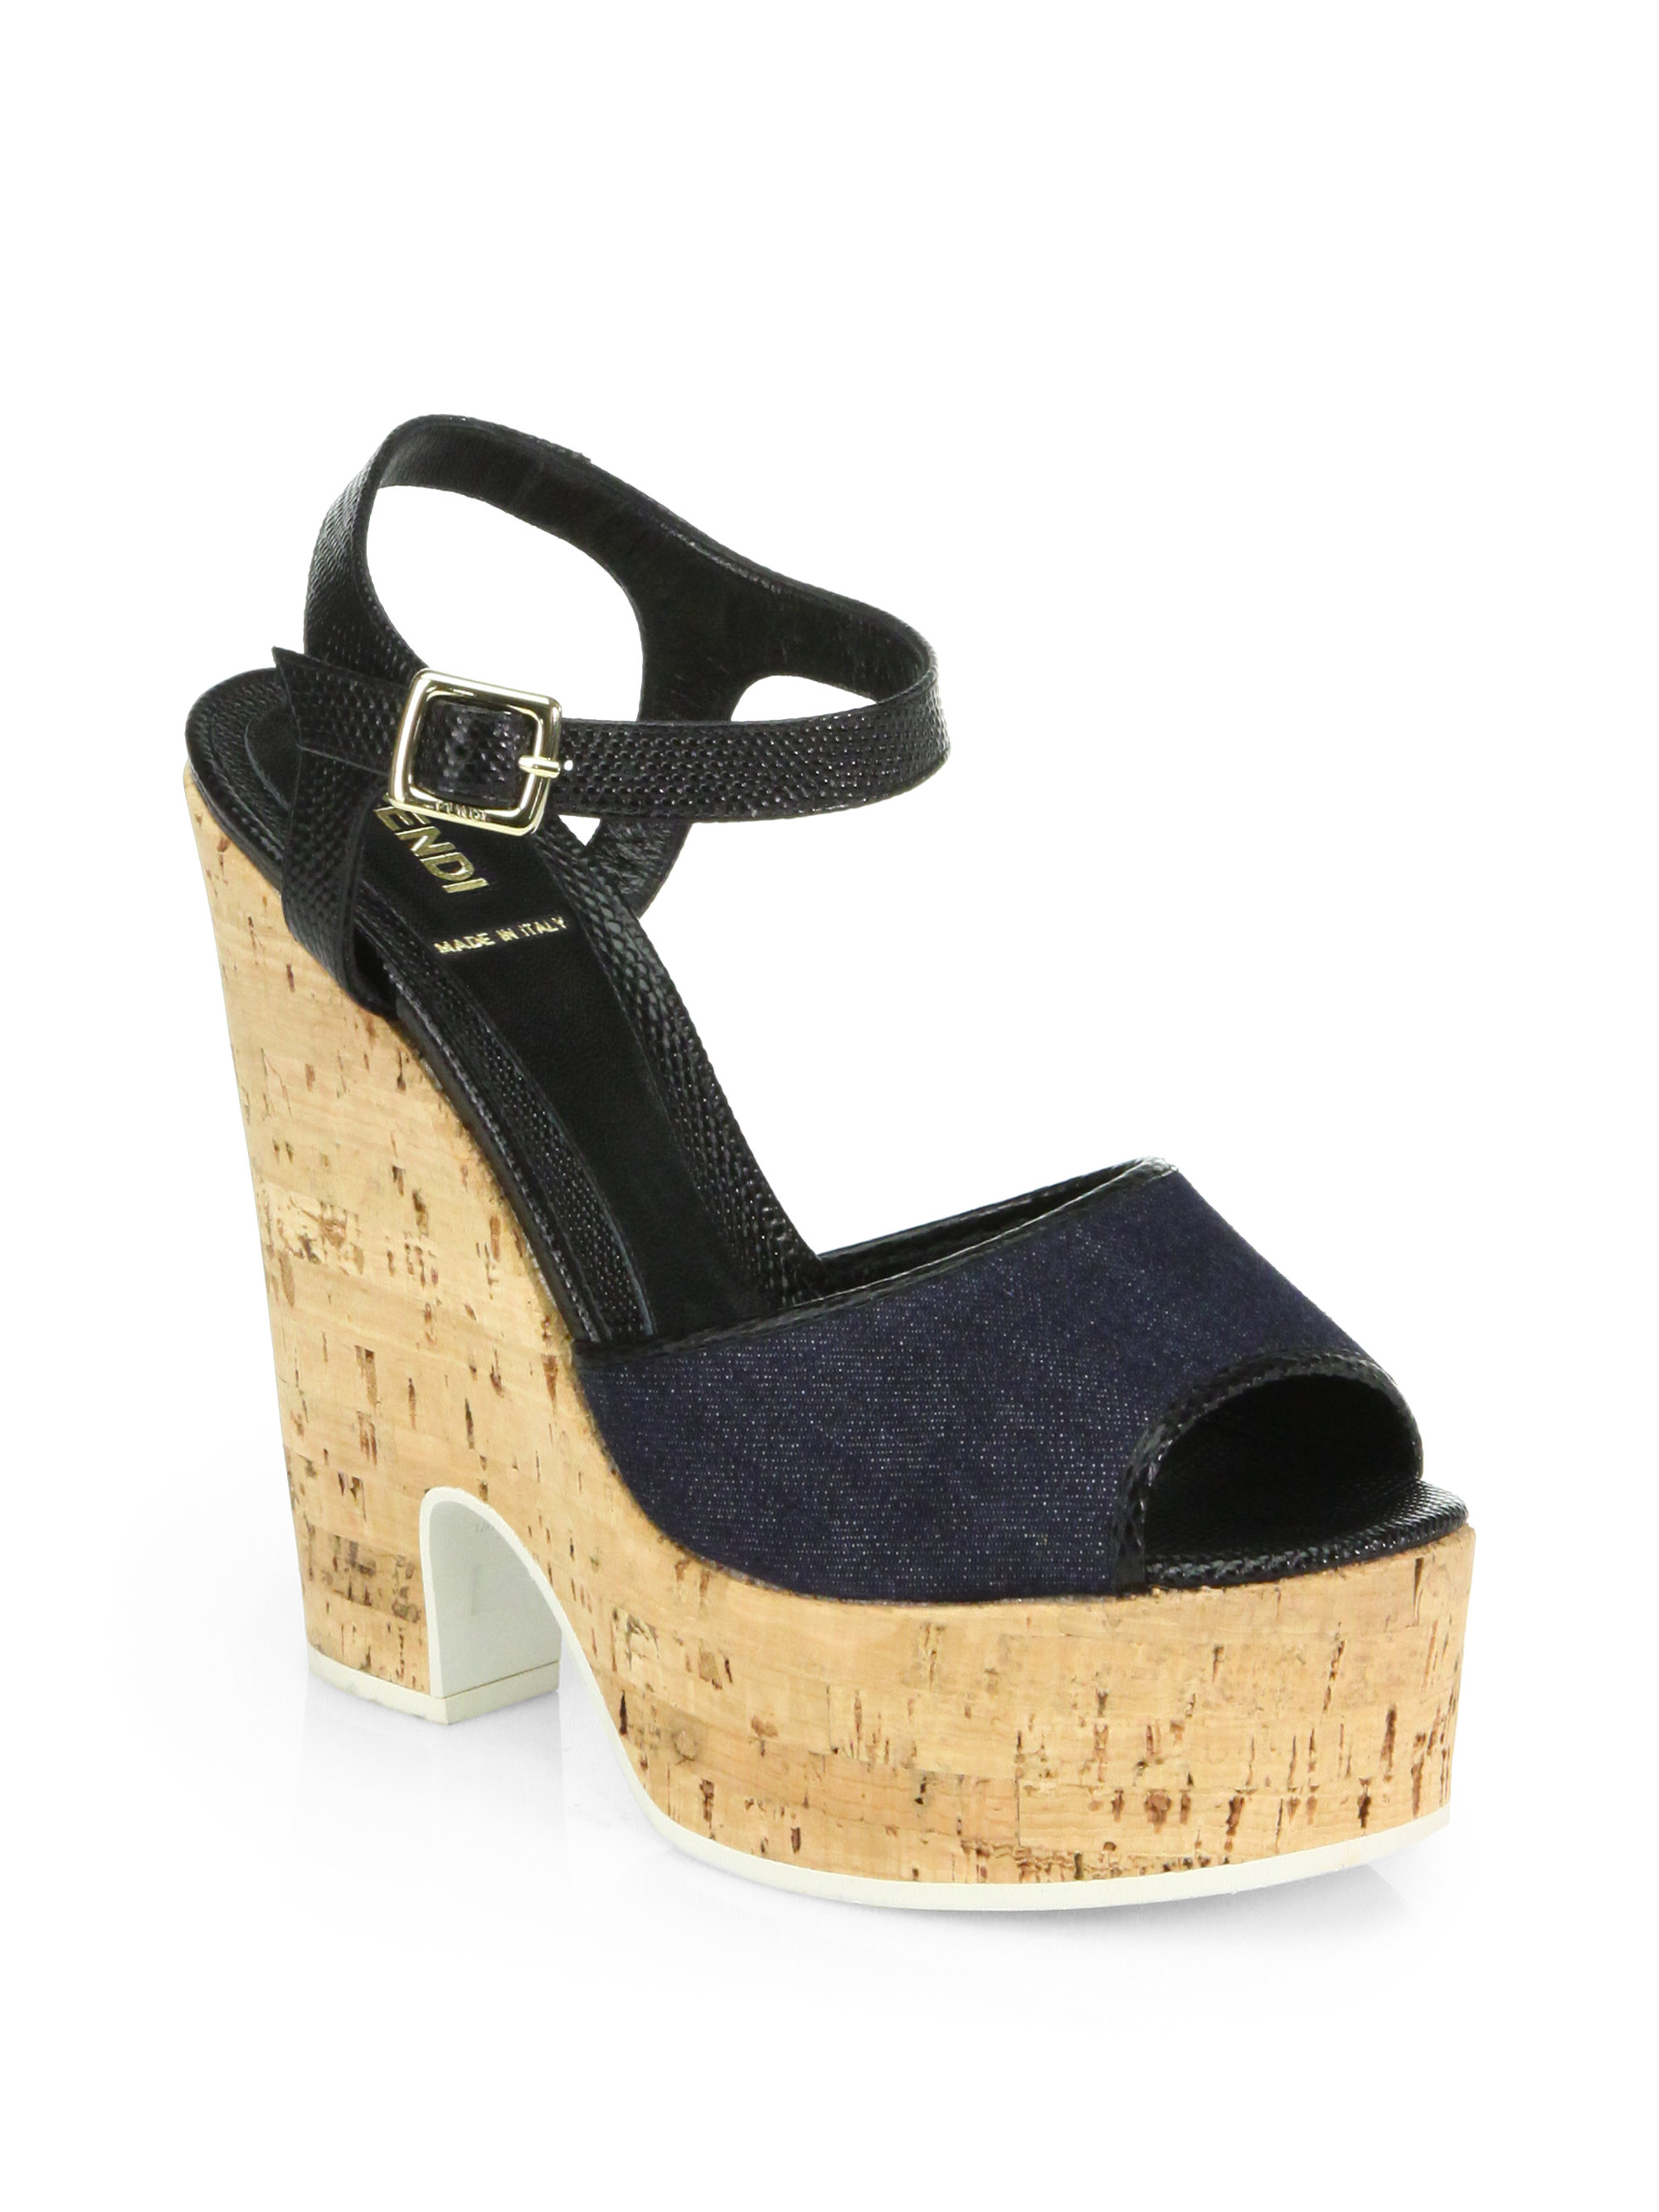 fendi cecilia denim cork wedge sandals in blue blue black